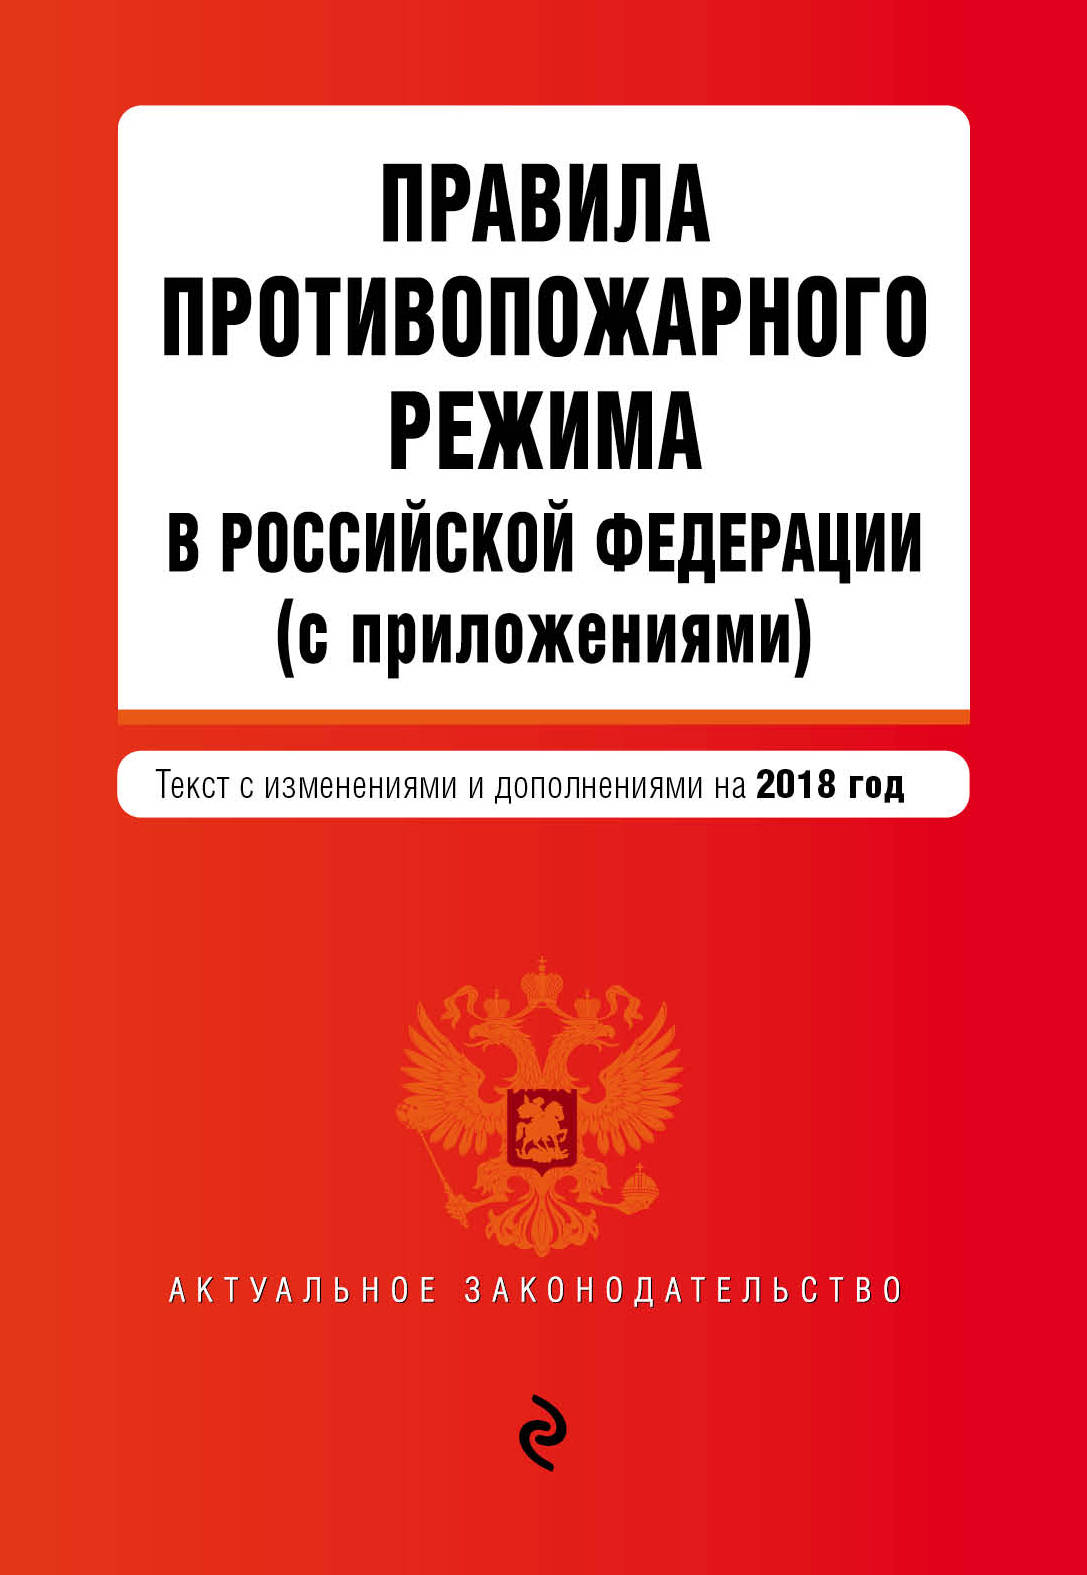 Pravila protivopozharnogo rezhima v Rossijskoj Federatsii (s prilozhenijami). Tekst s poslednimi izm. i dop. na 2018 g.